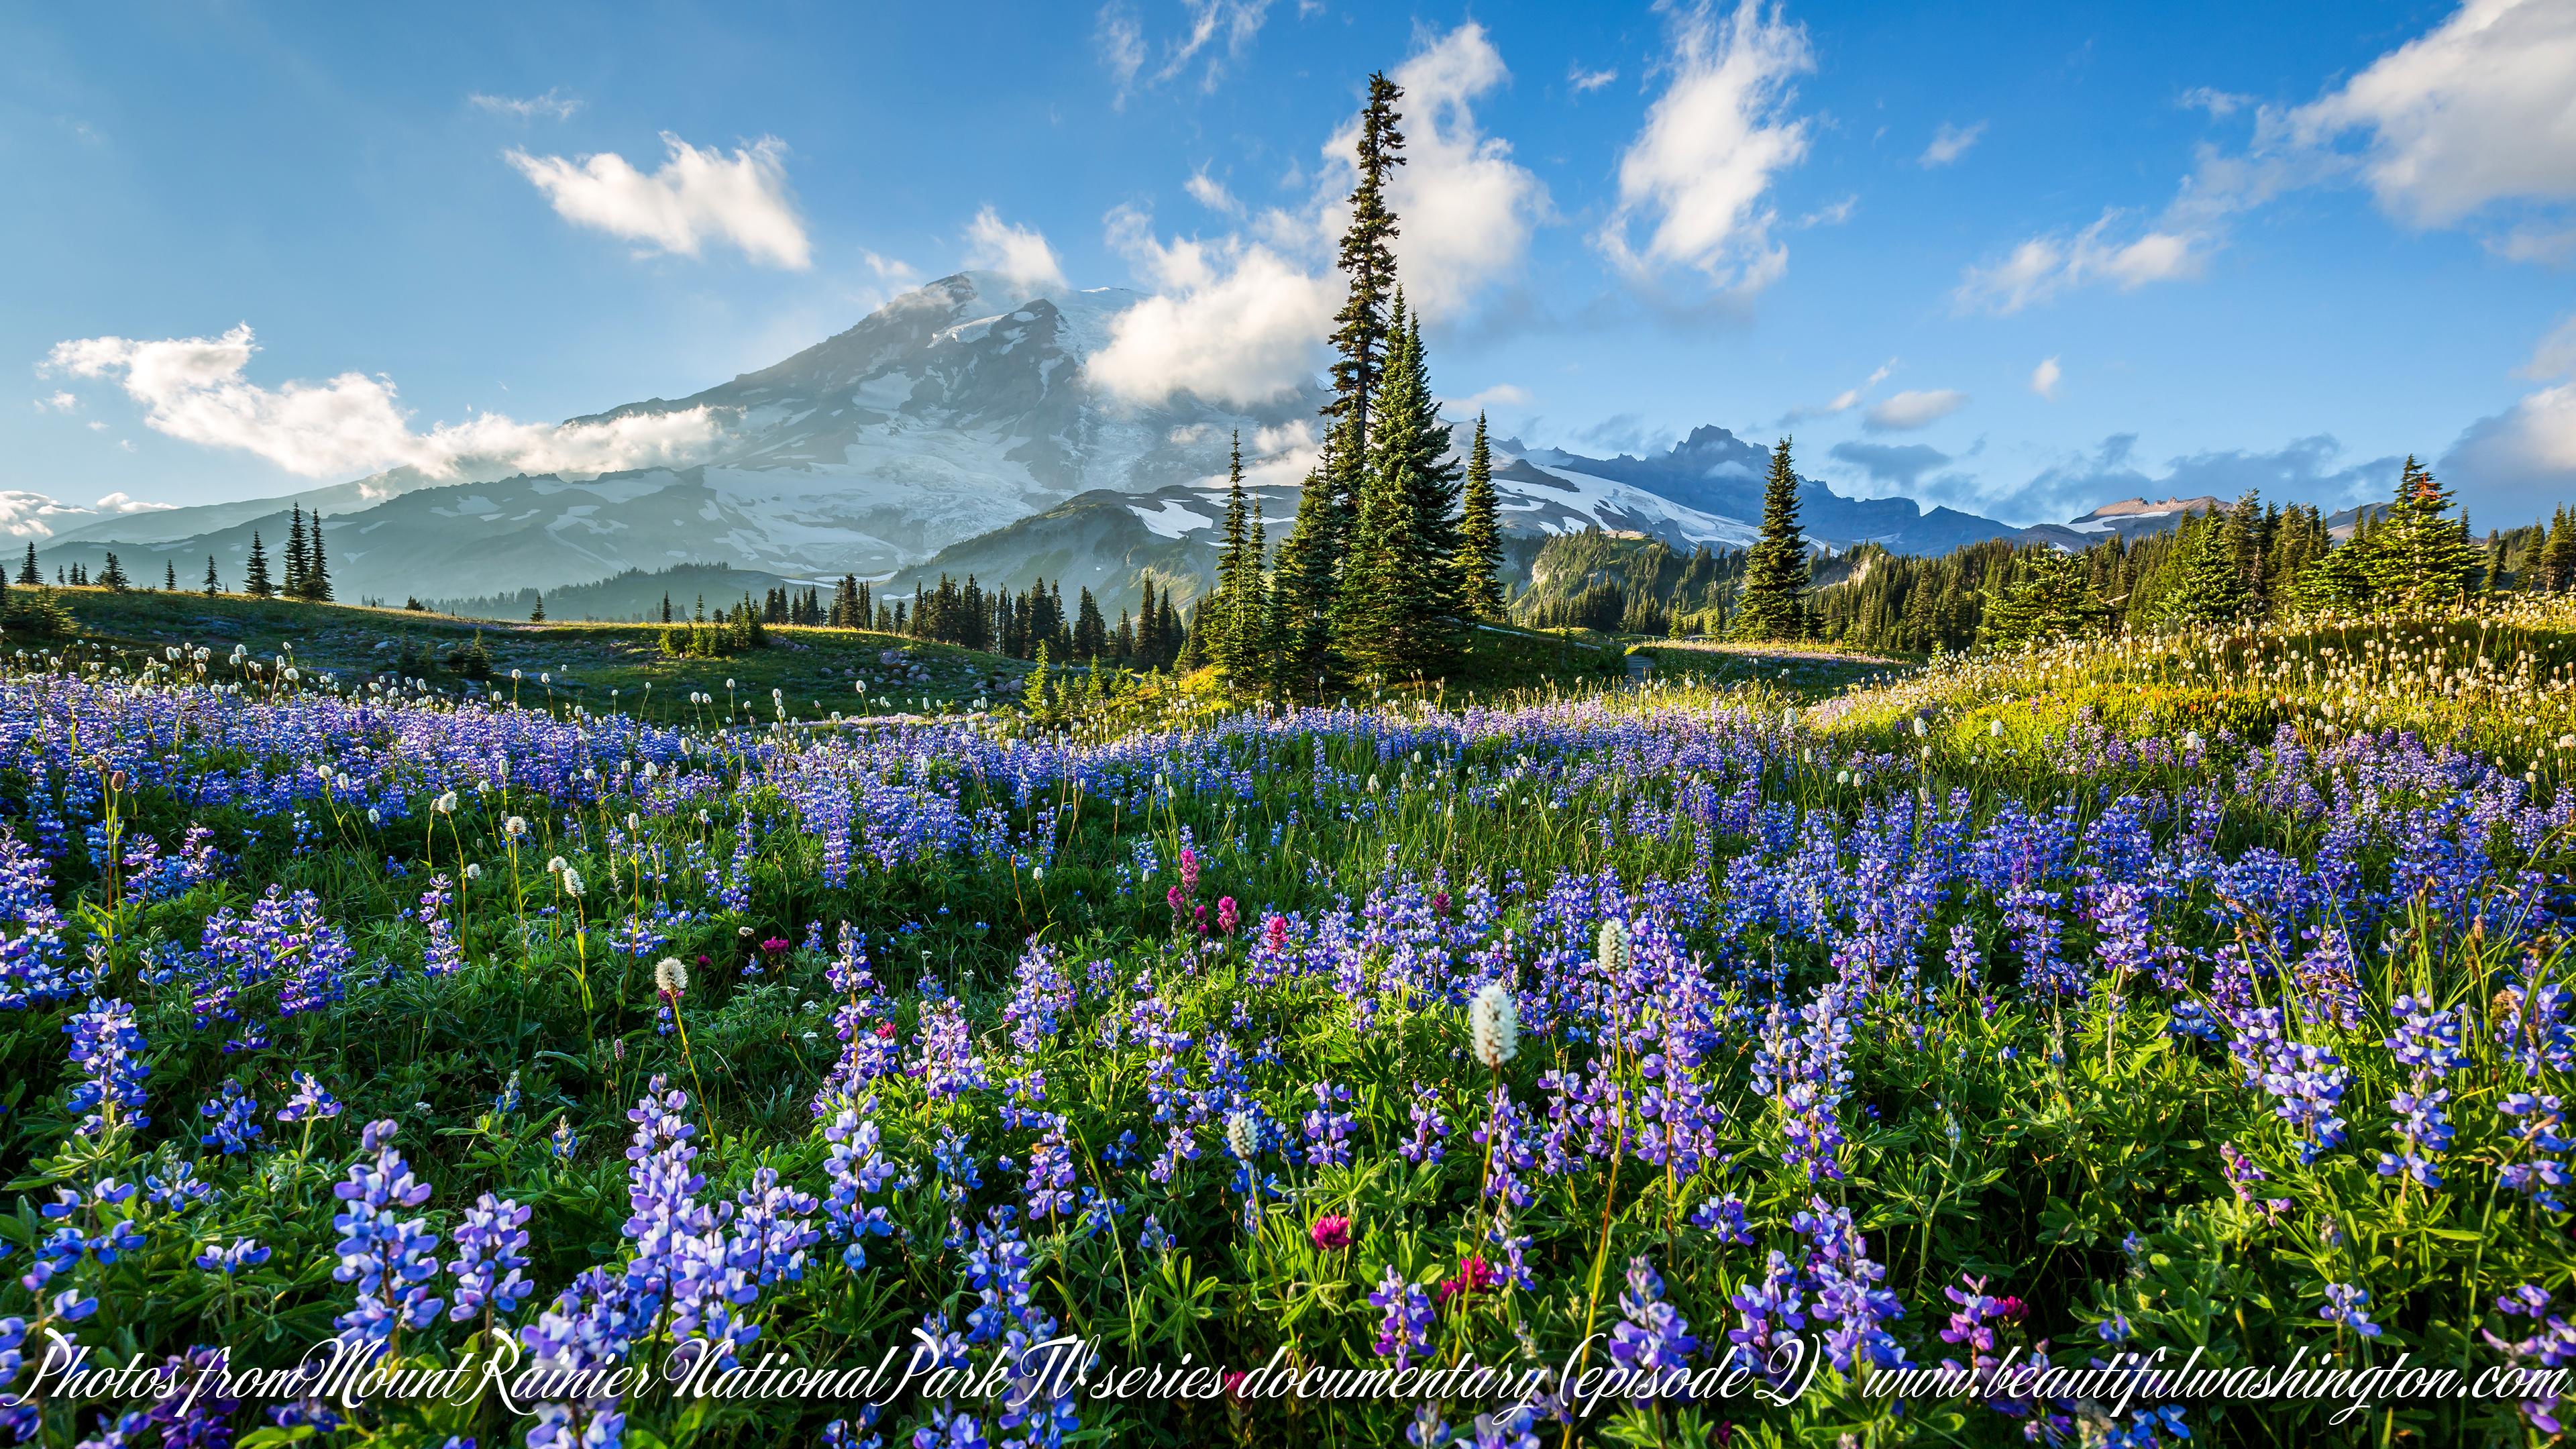 Mount Rainier National Park 4k Series Episode 2